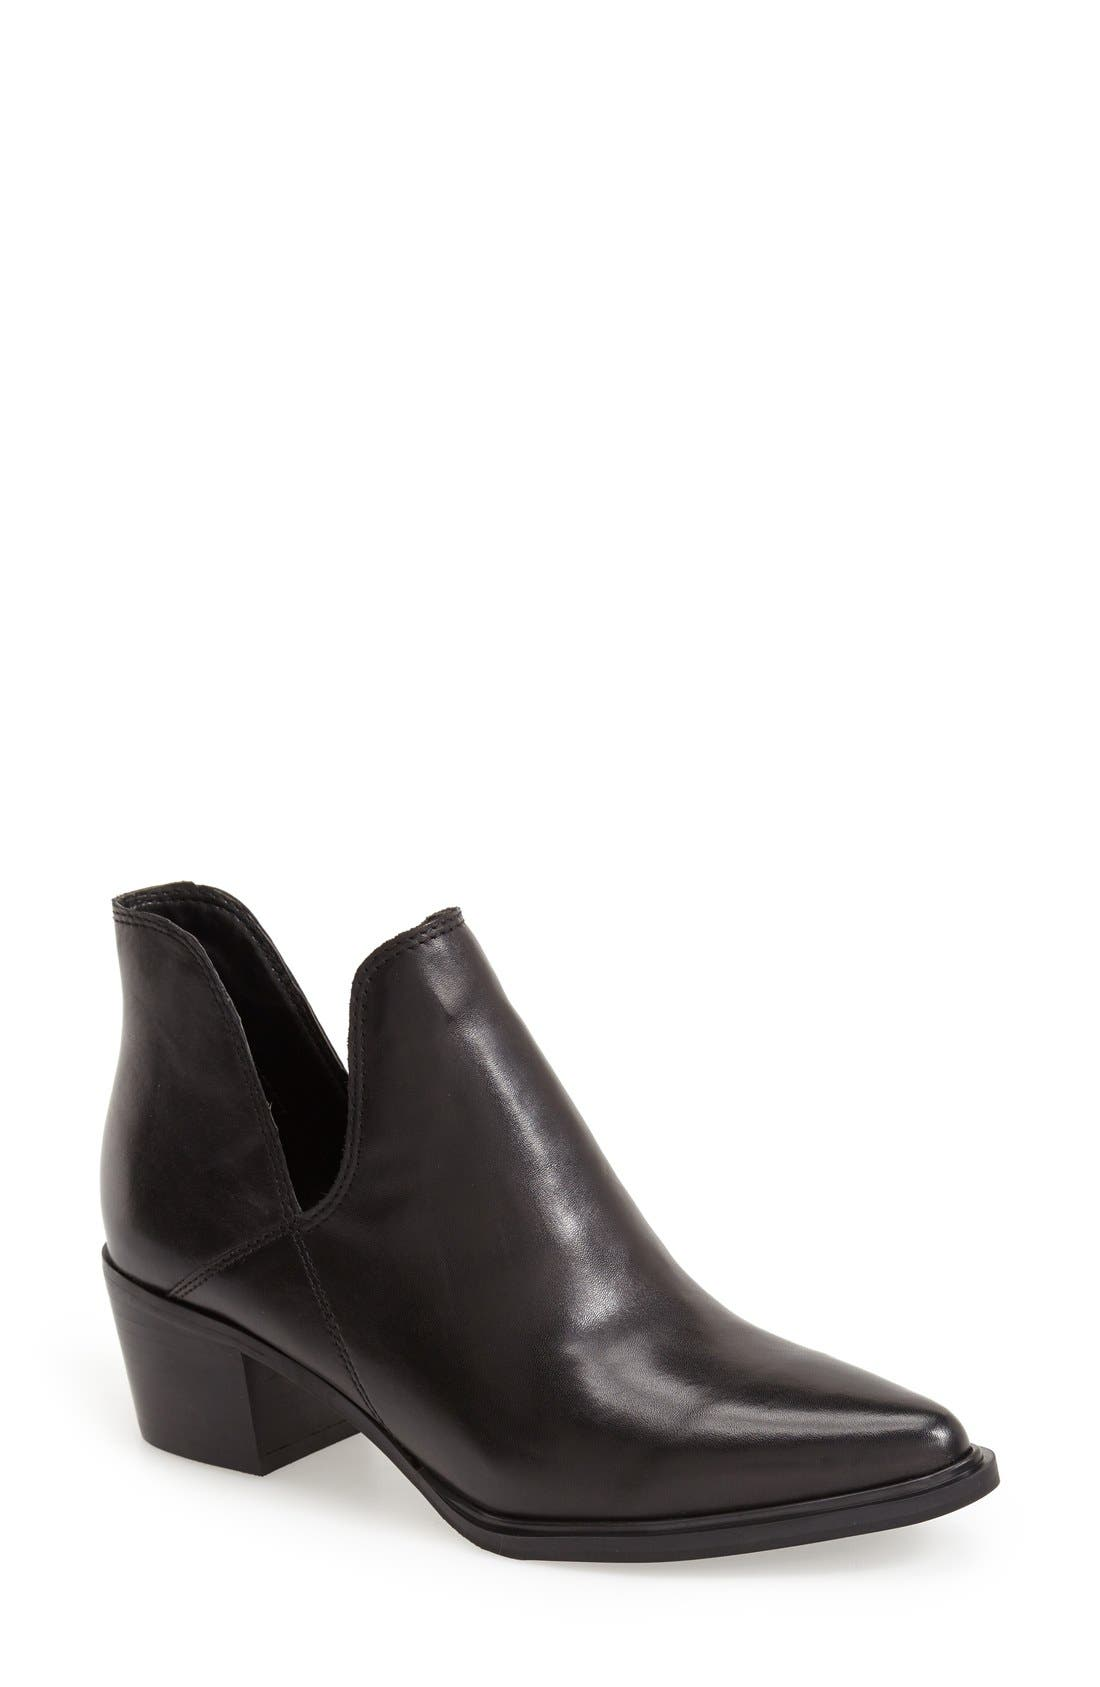 'Dextir' Pointy Toe Ankle Bootie,                         Main,                         color, 001